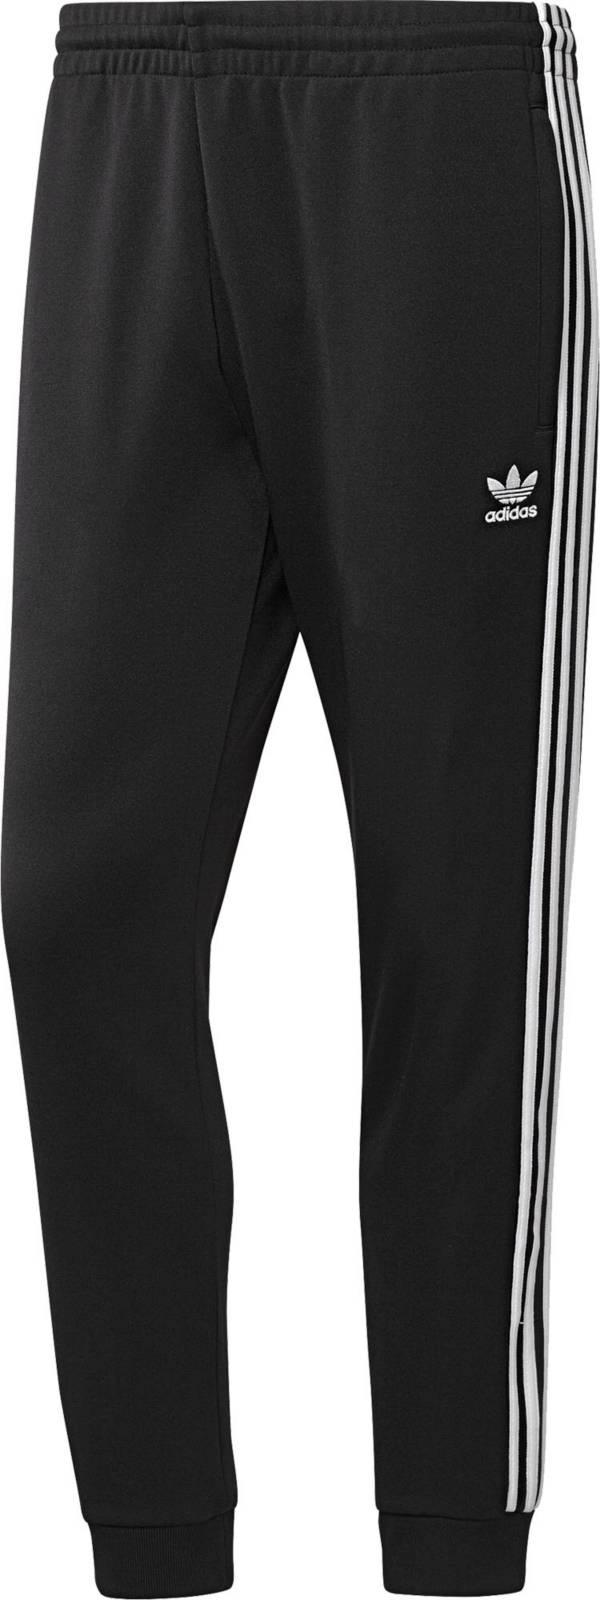 adidas Originals Men's Superstar Track Jogger Pants product image